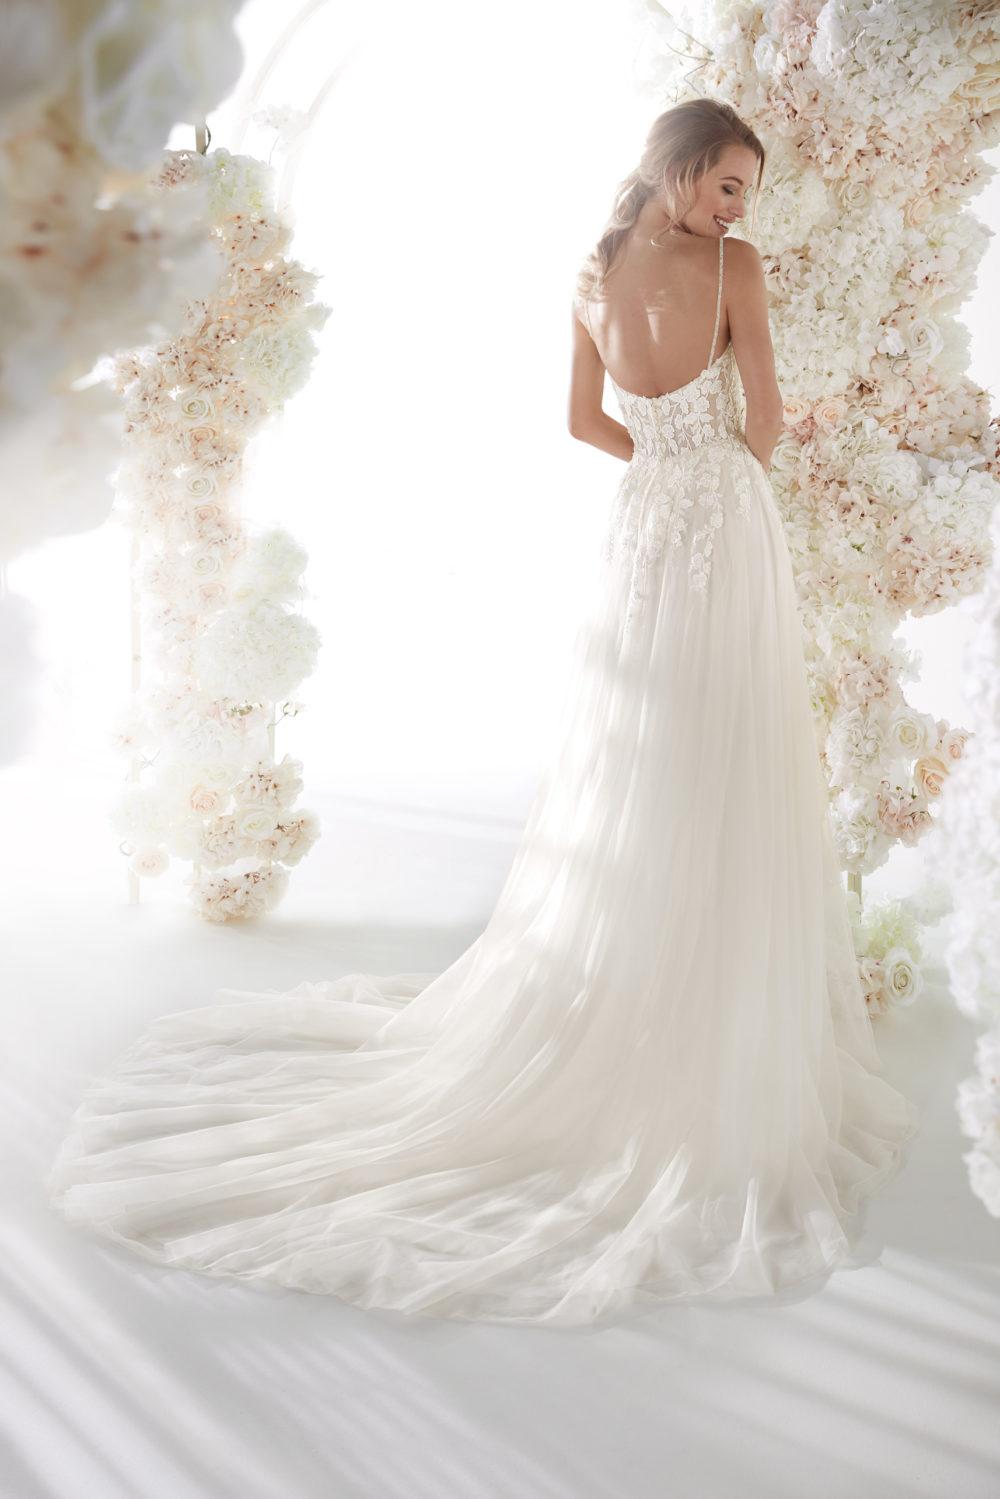 Mariages: abito da sposa Colet 2020 a Vicenza, Verona, Padova, Veneto COA20171